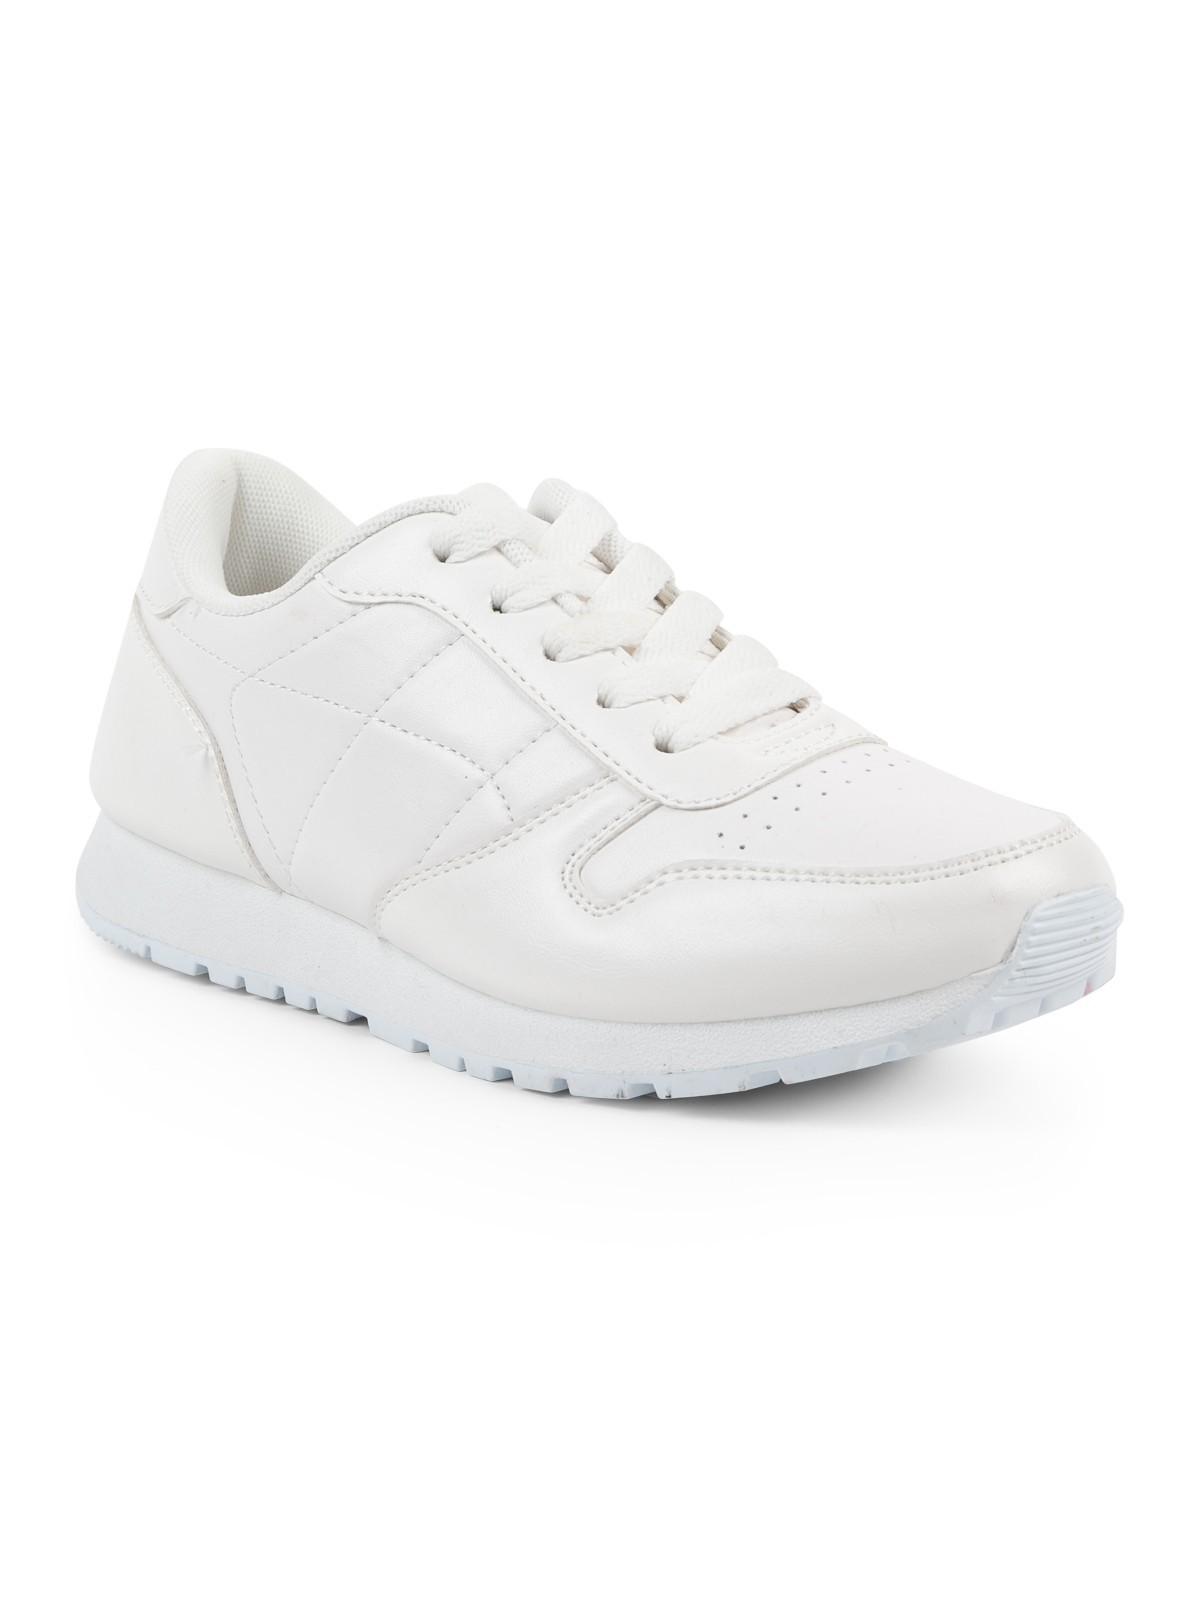 Basket femme coloris blanc (36 41) DistriCenter